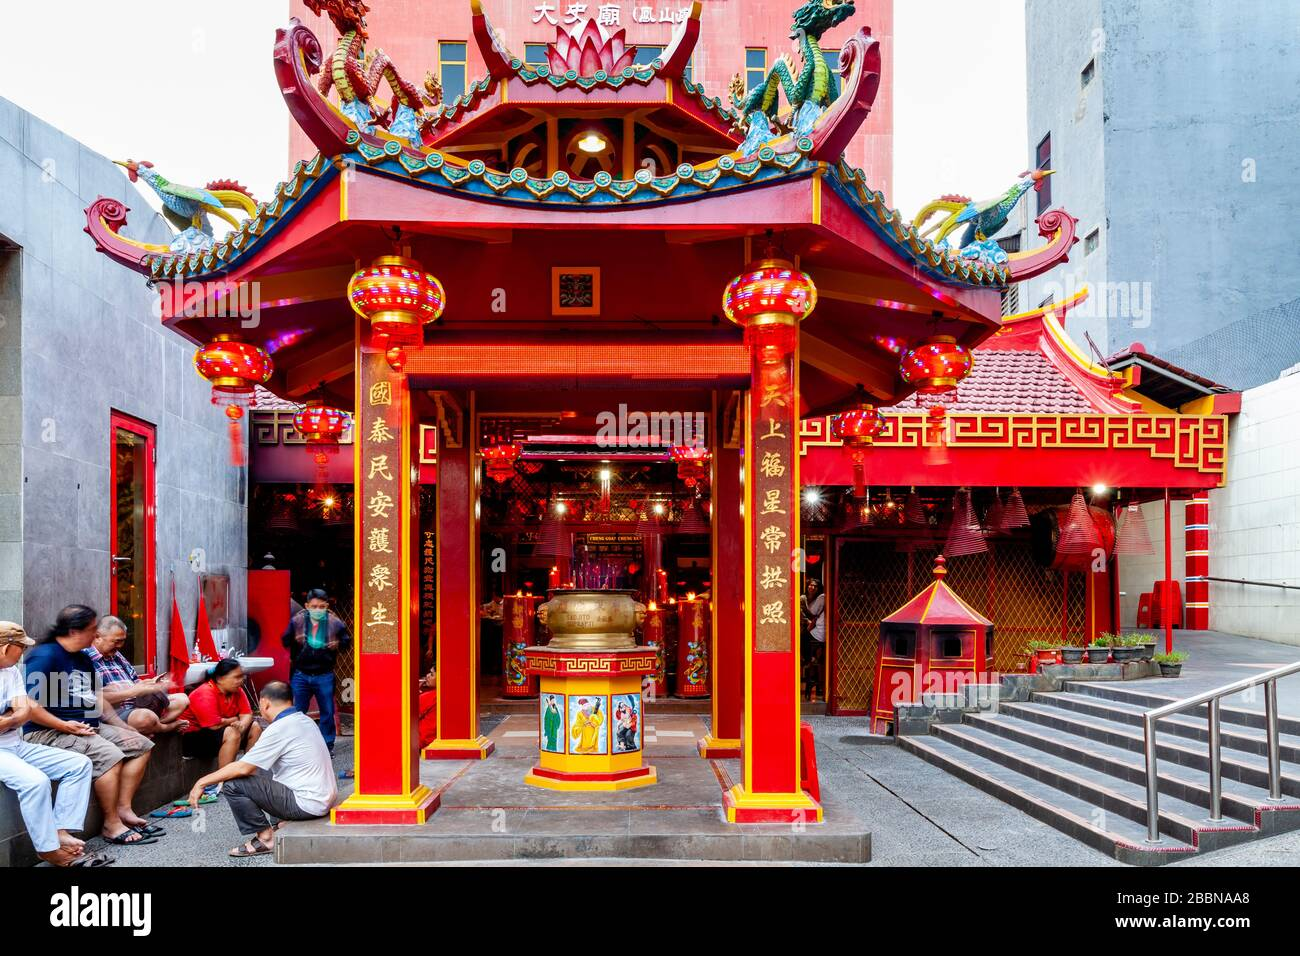 Templo de Toasebio, Chinatown, Yakarta, Indonesia. Foto de stock